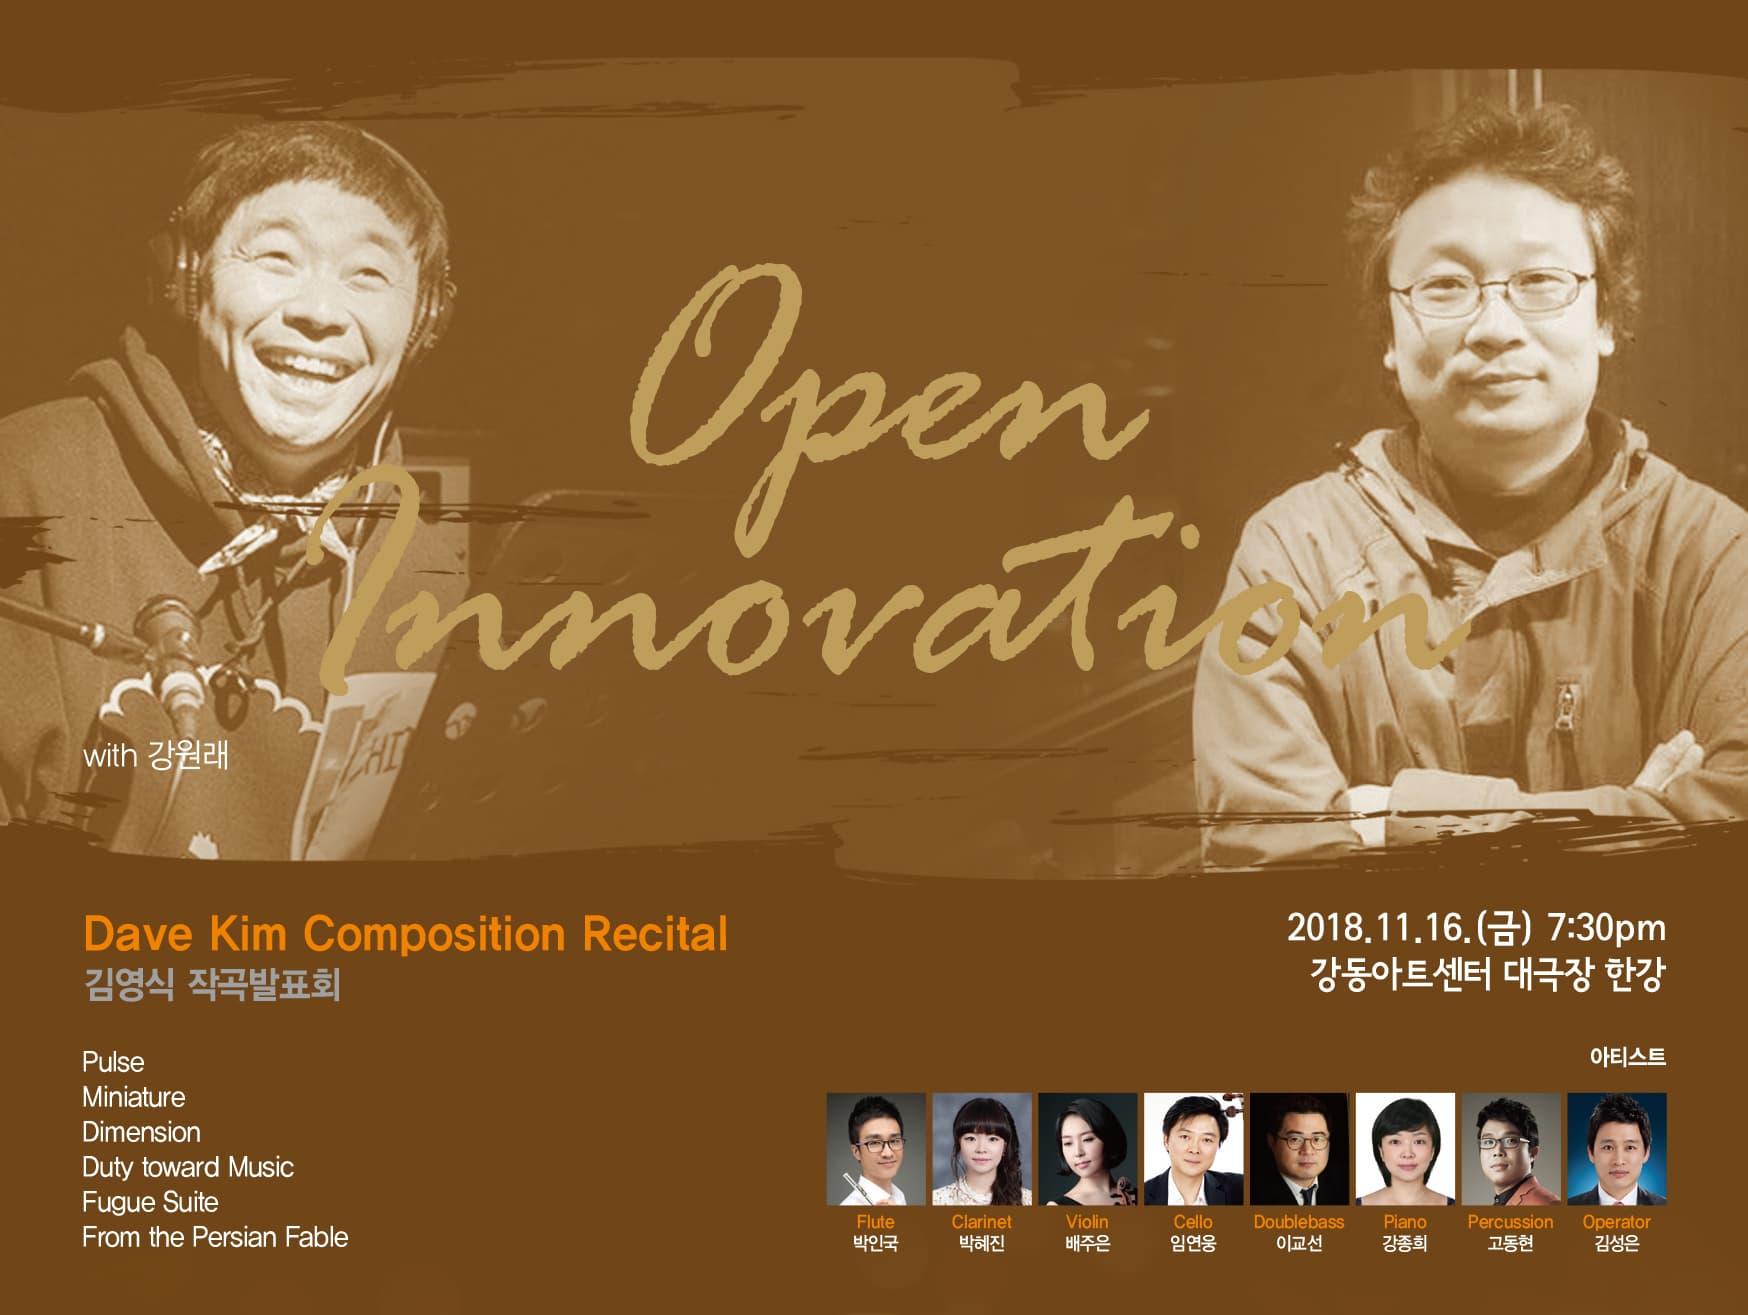 Open Innovation 김영식 작곡발표회